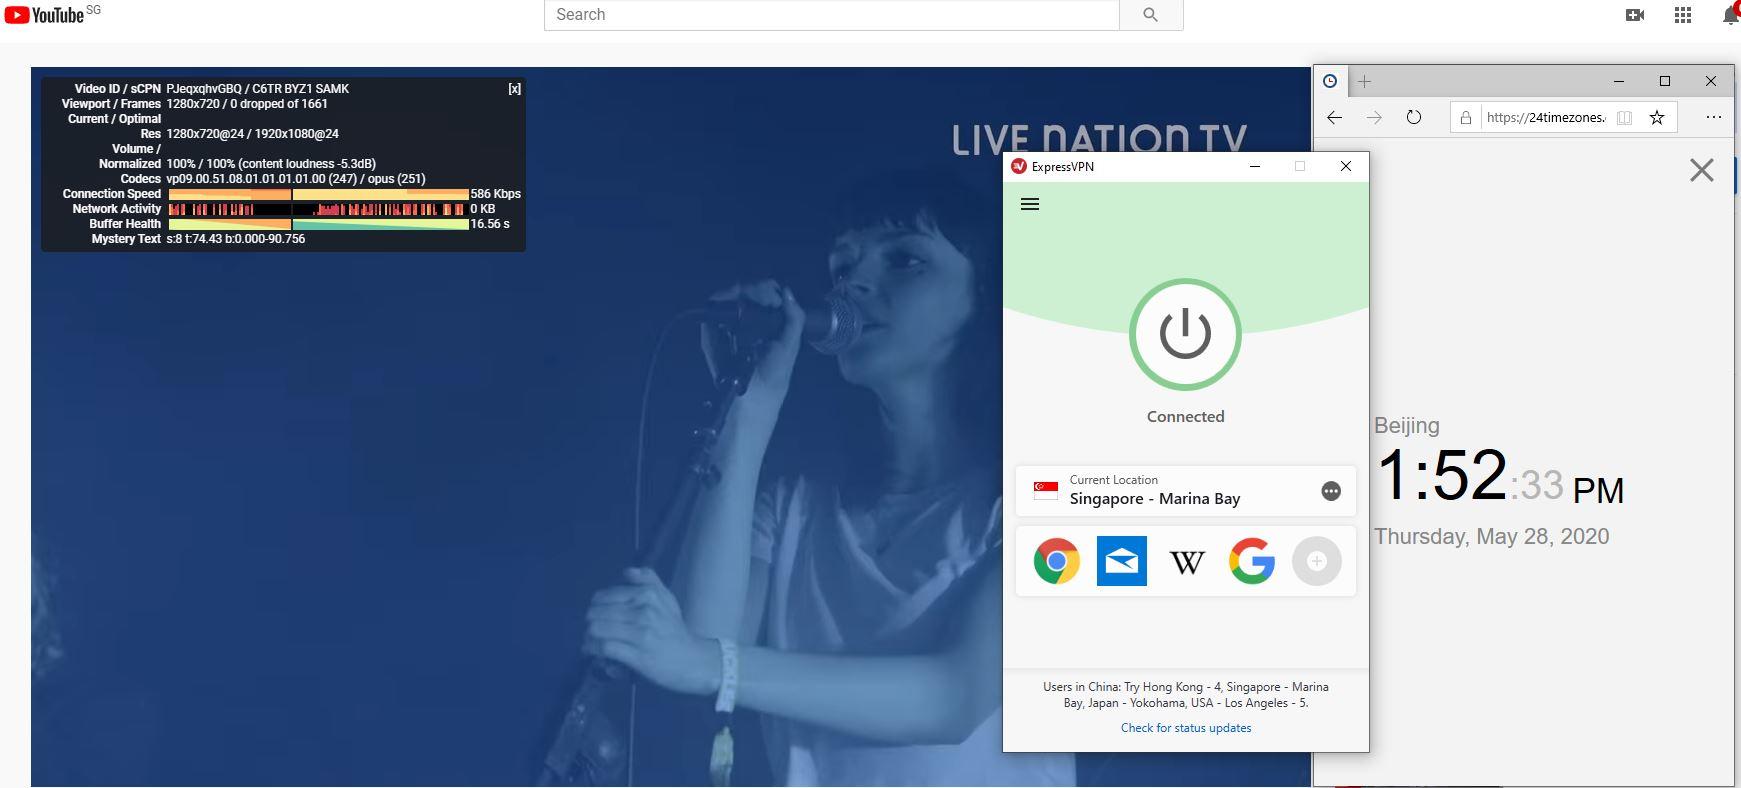 Windows10 ExpressVPN Singapore - Marina Bay 中国VPN 翻墙 科学上网 测速-20200528